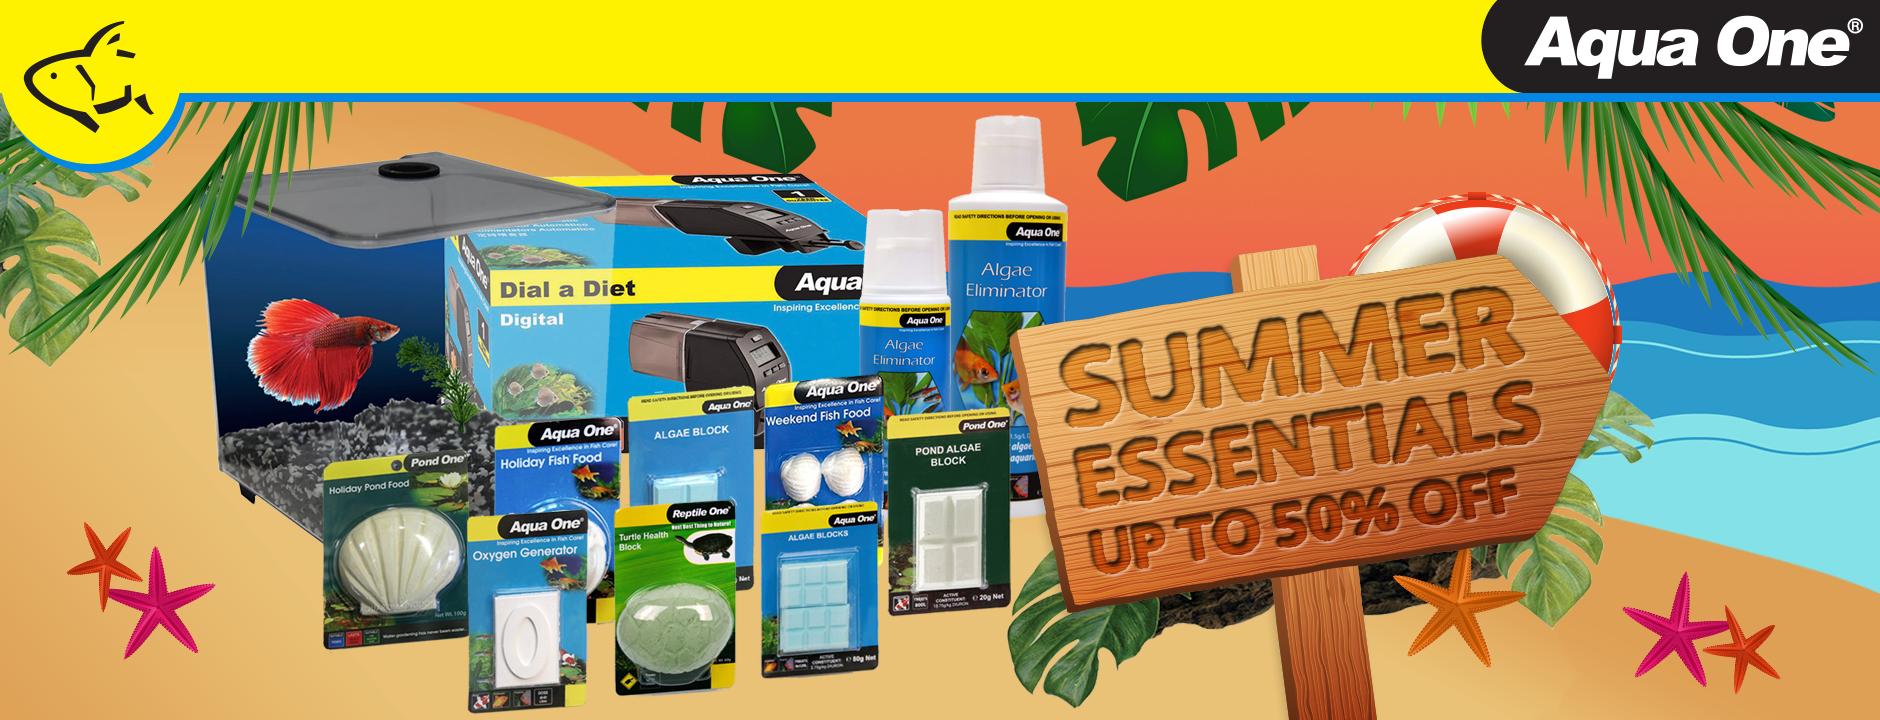 summer-essentials-web-banner.png